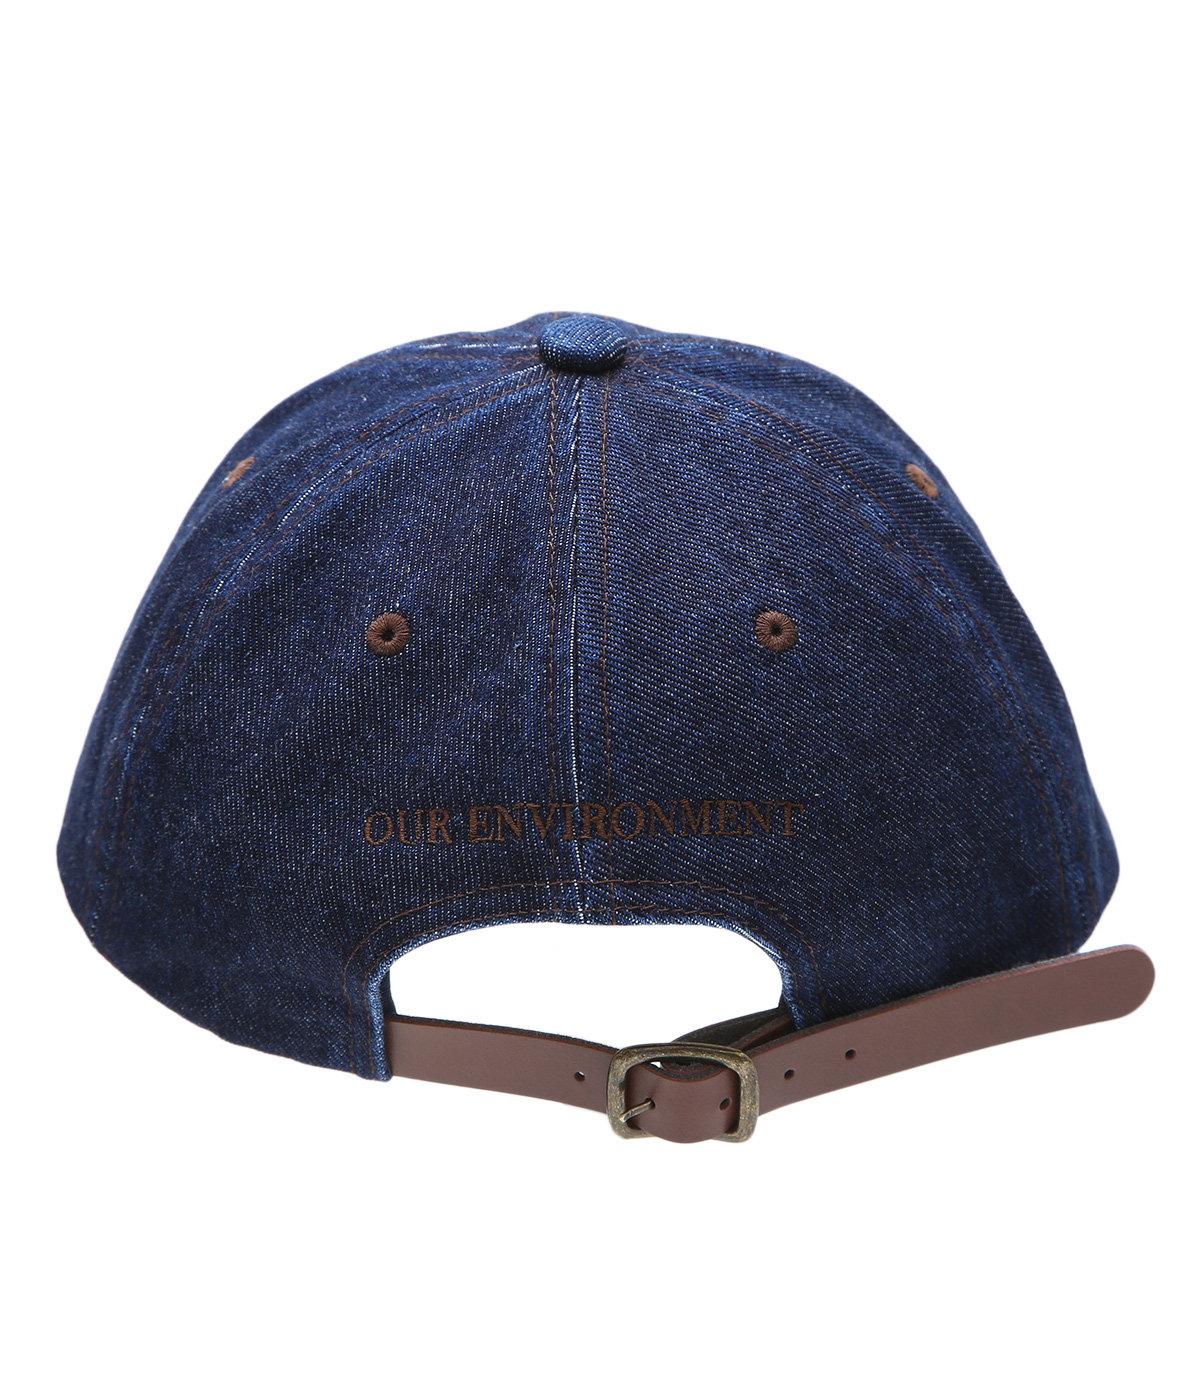 SPY HOP 6PANEL CAP